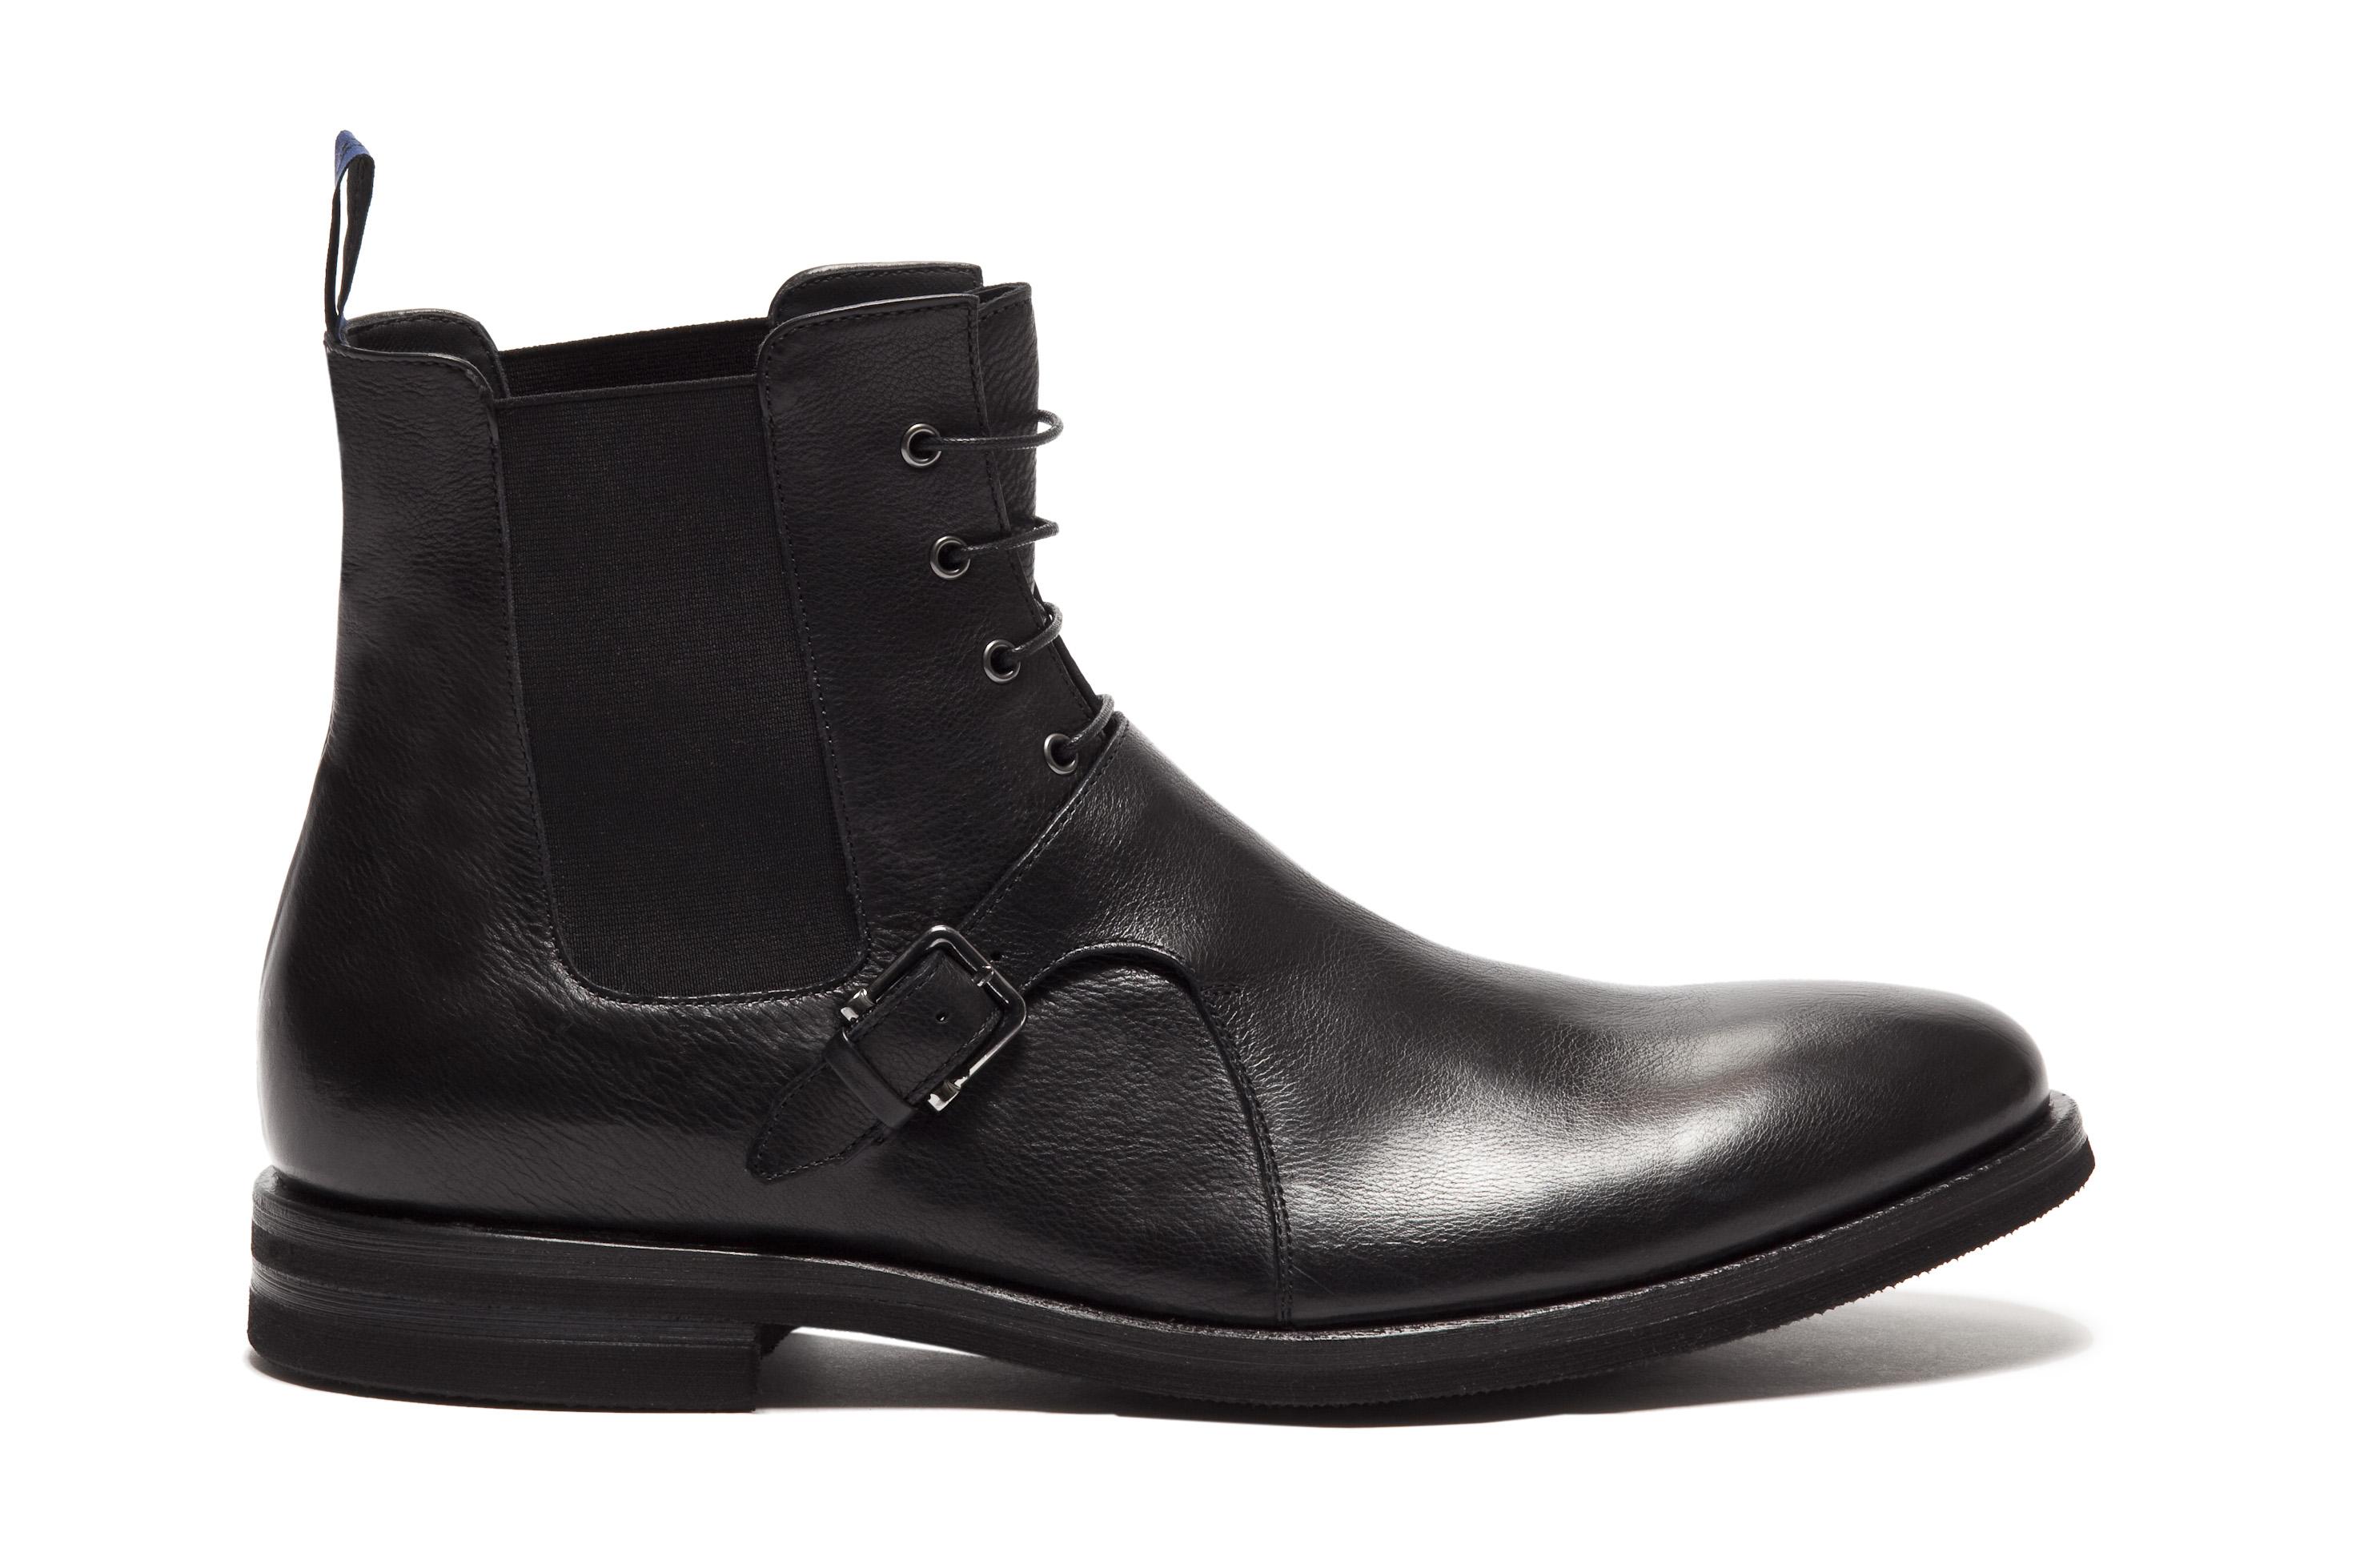 alberto guardiani biker boot (3)